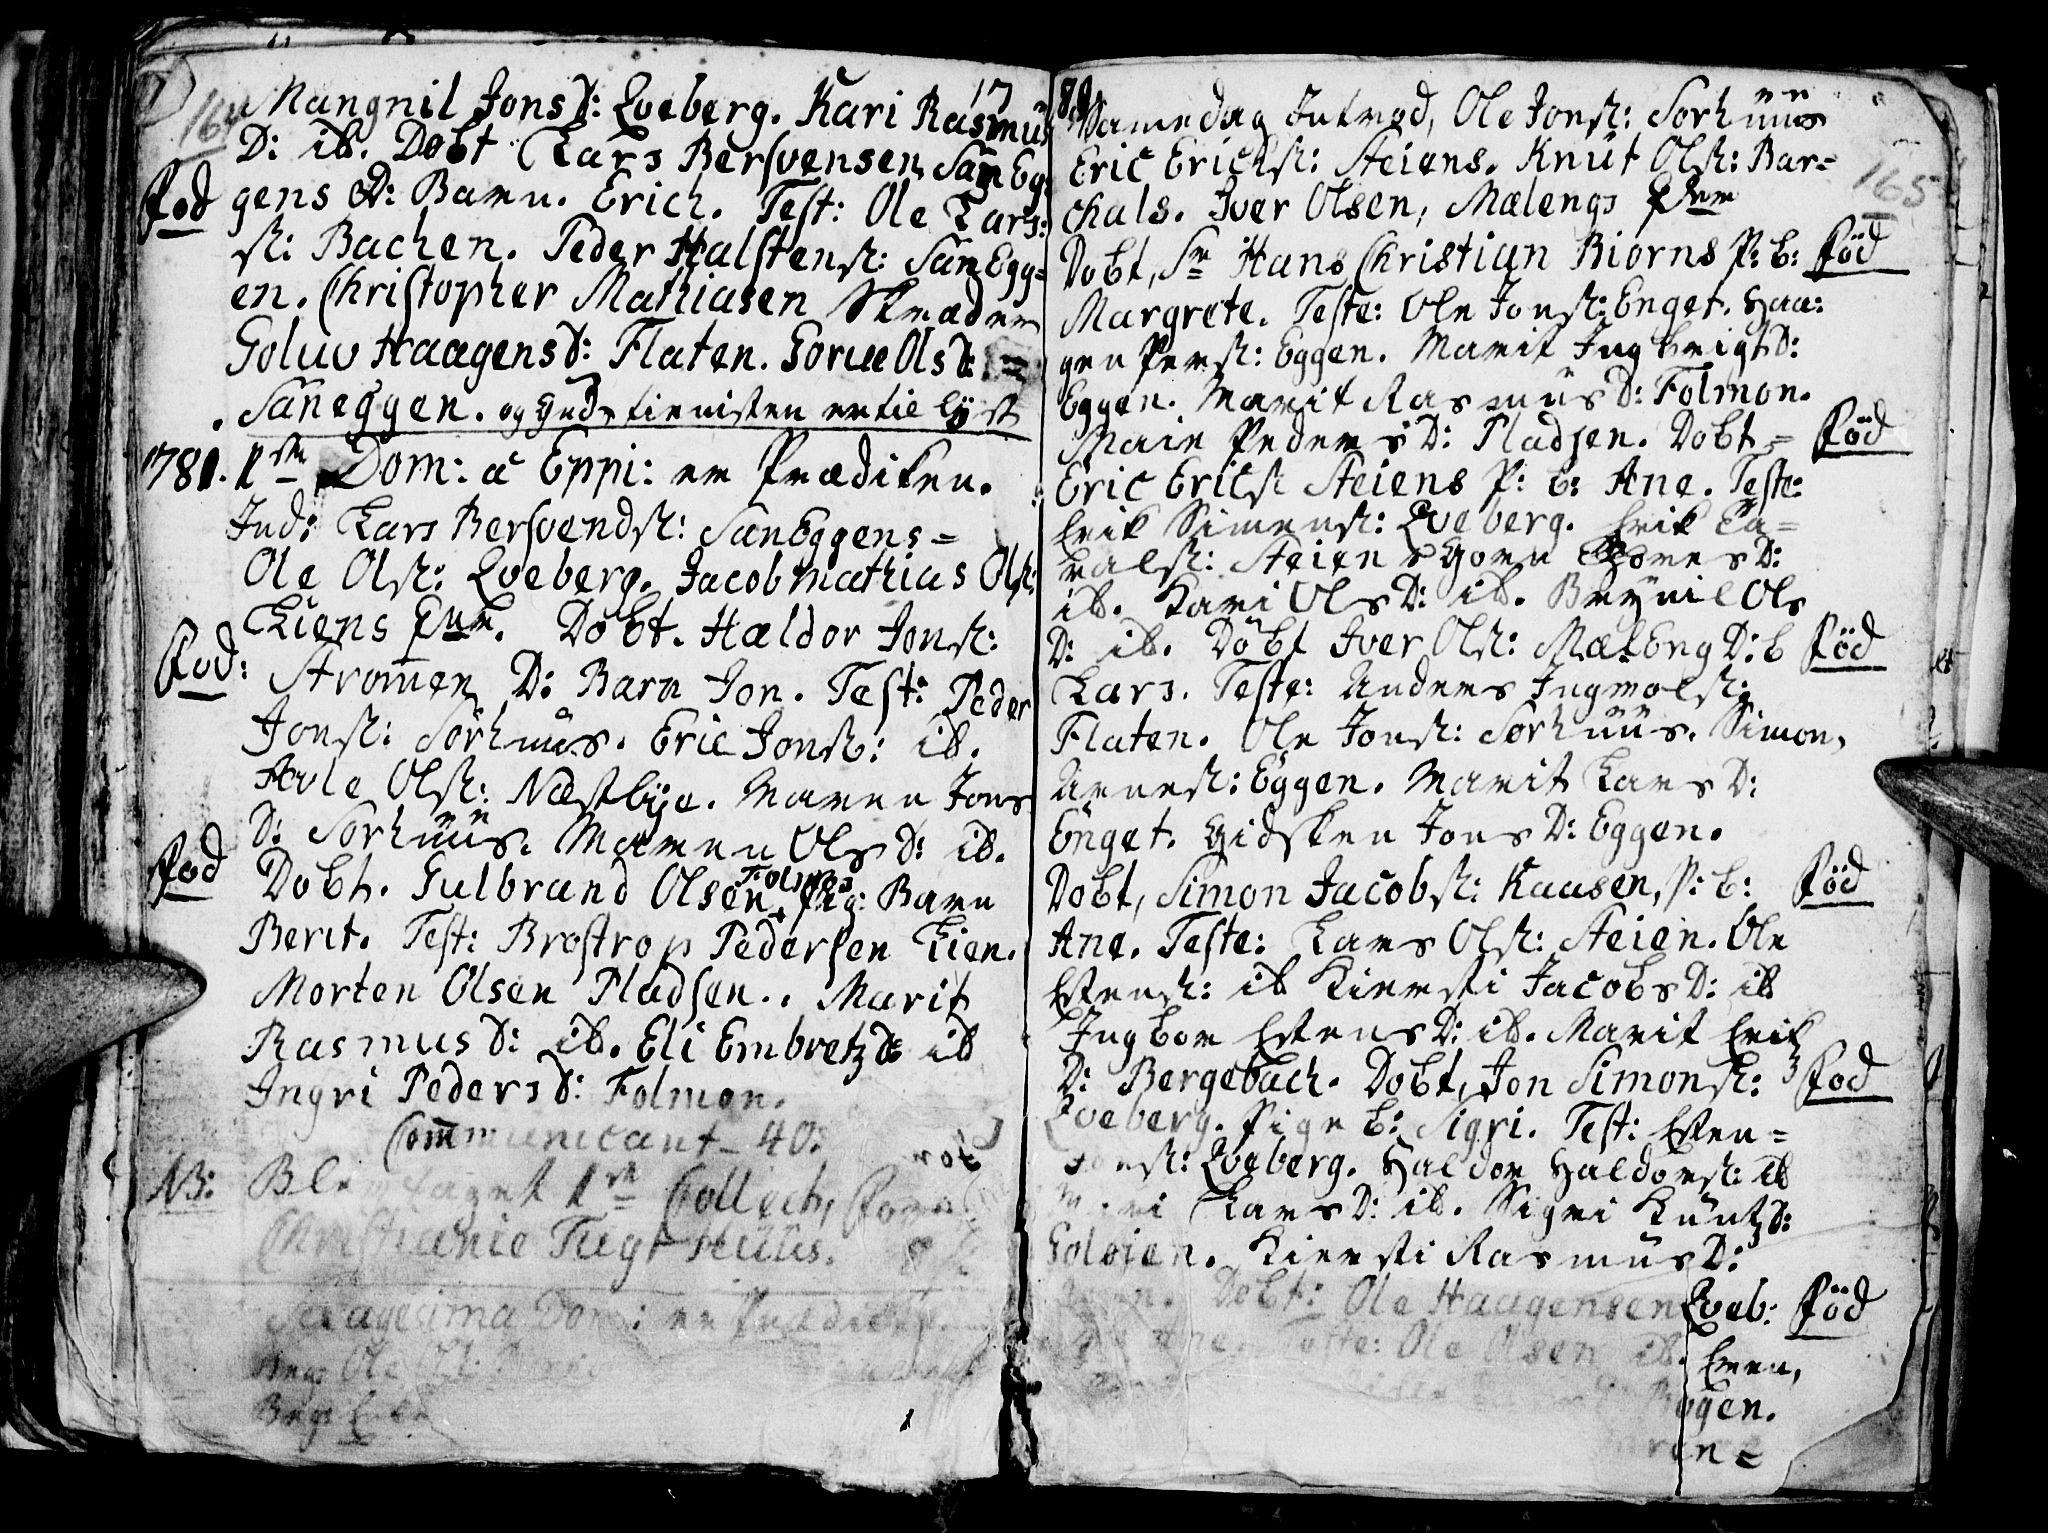 SAH, Tynset prestekontor, Ministerialbok nr. 9, 1769-1781, s. 164-165